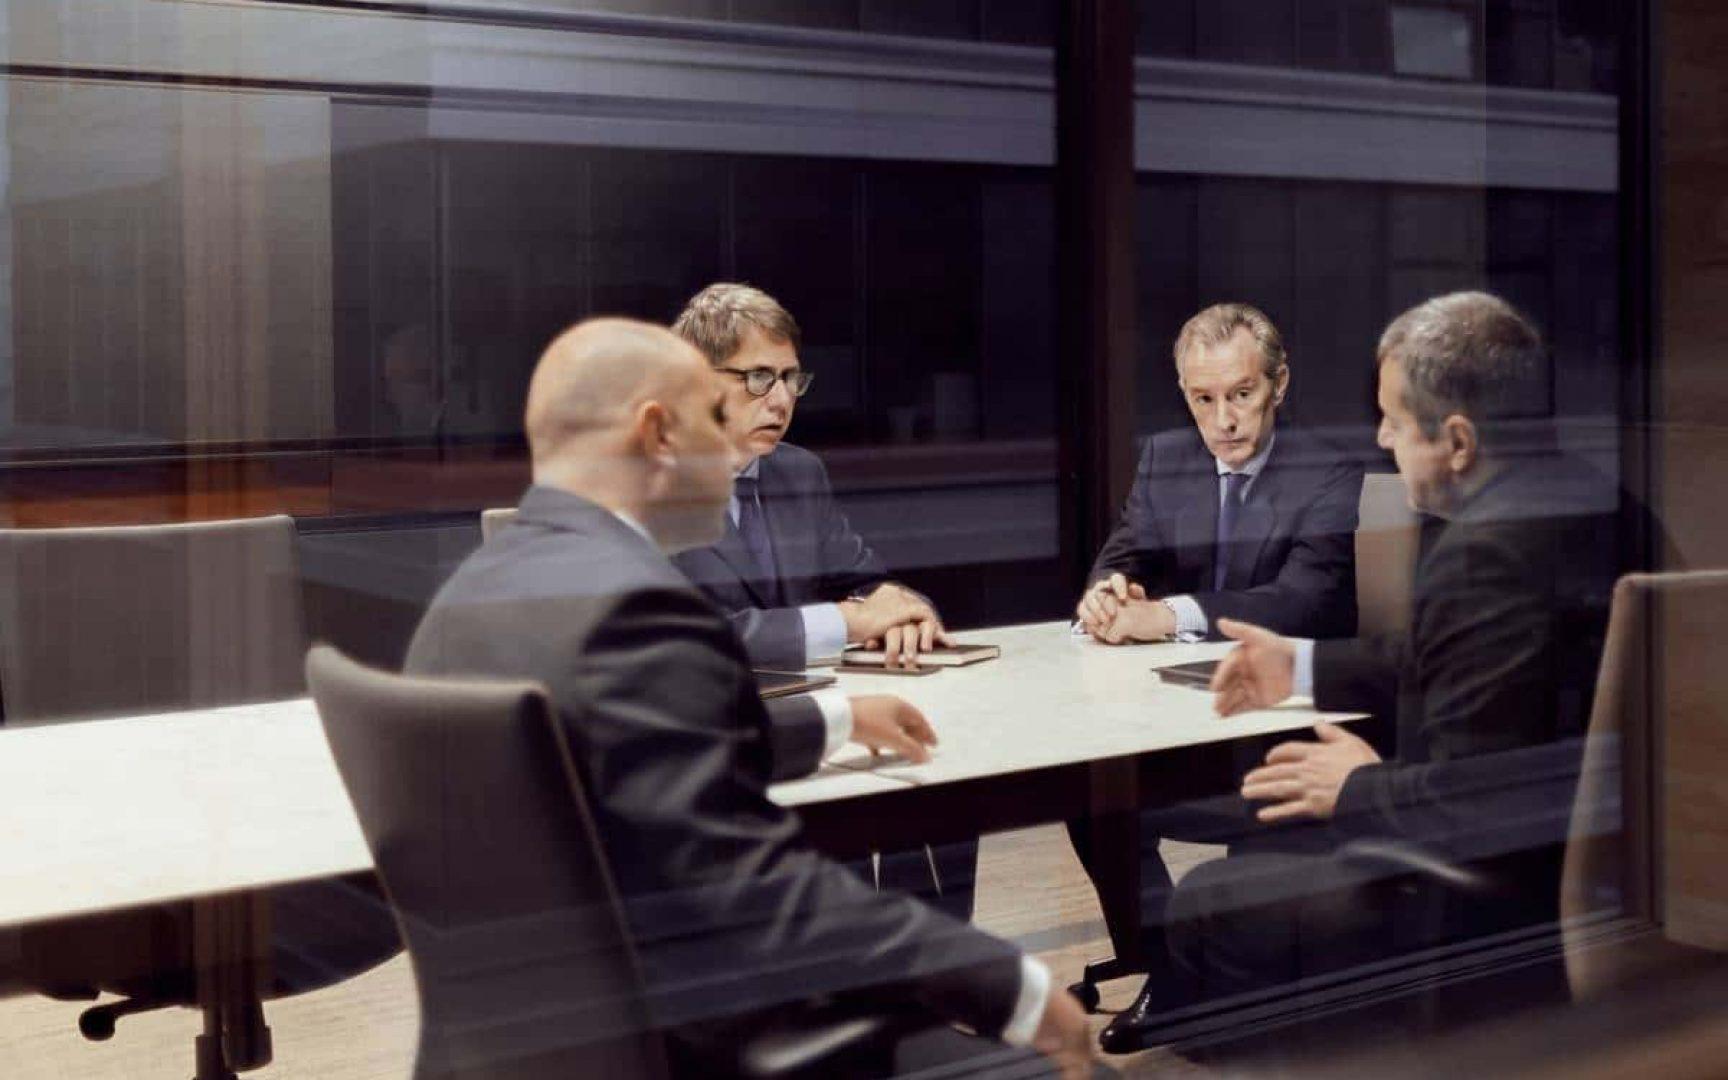 Executive businessmen talking in a dark meeting room